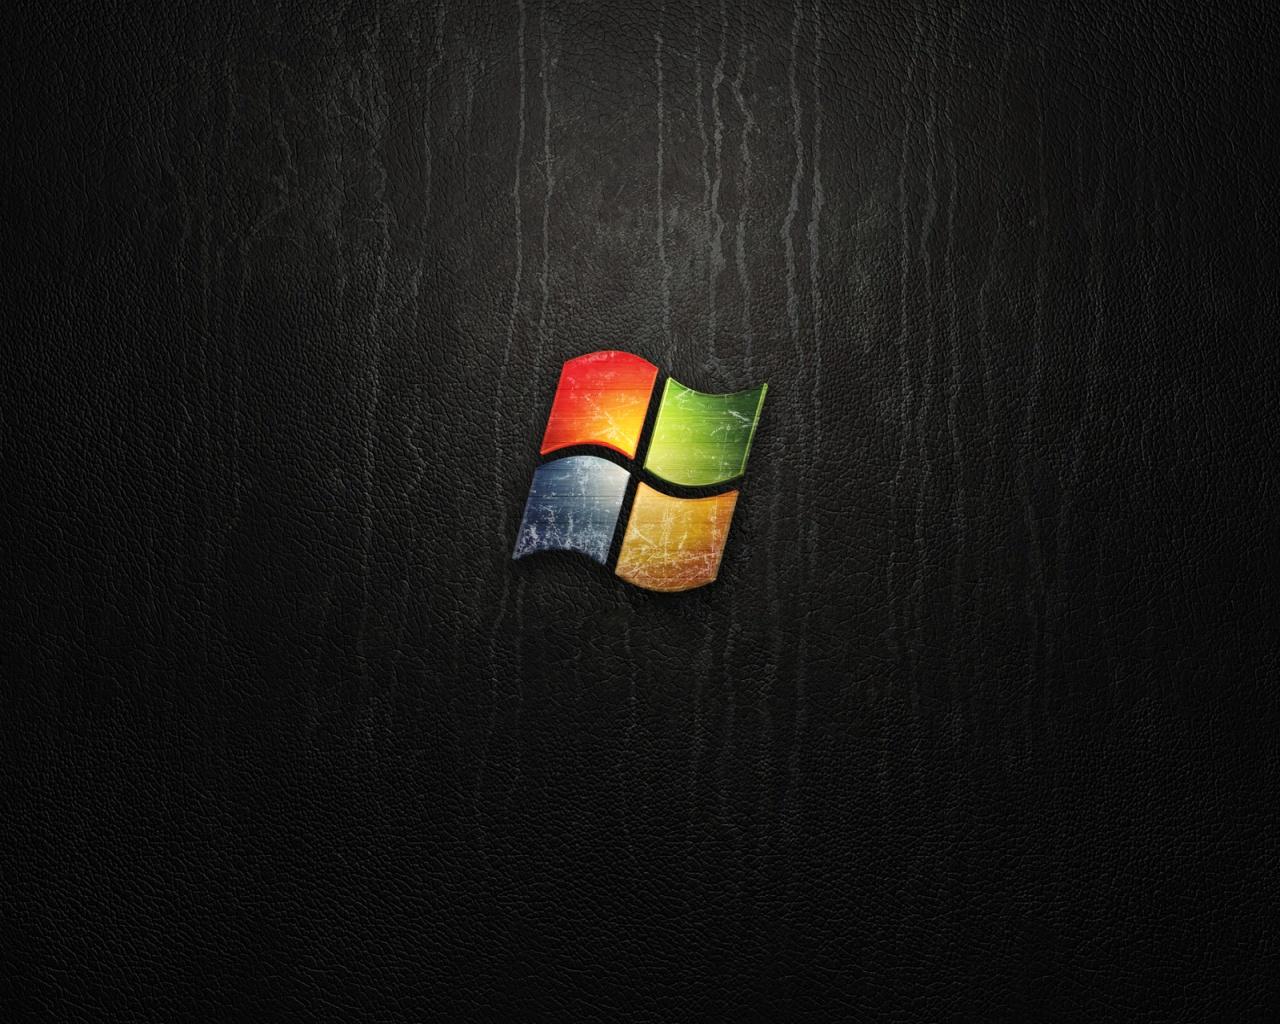 1280x1024 Weathered Windows Wallpaper desktop PC and Mac wallpaper 1280x1024